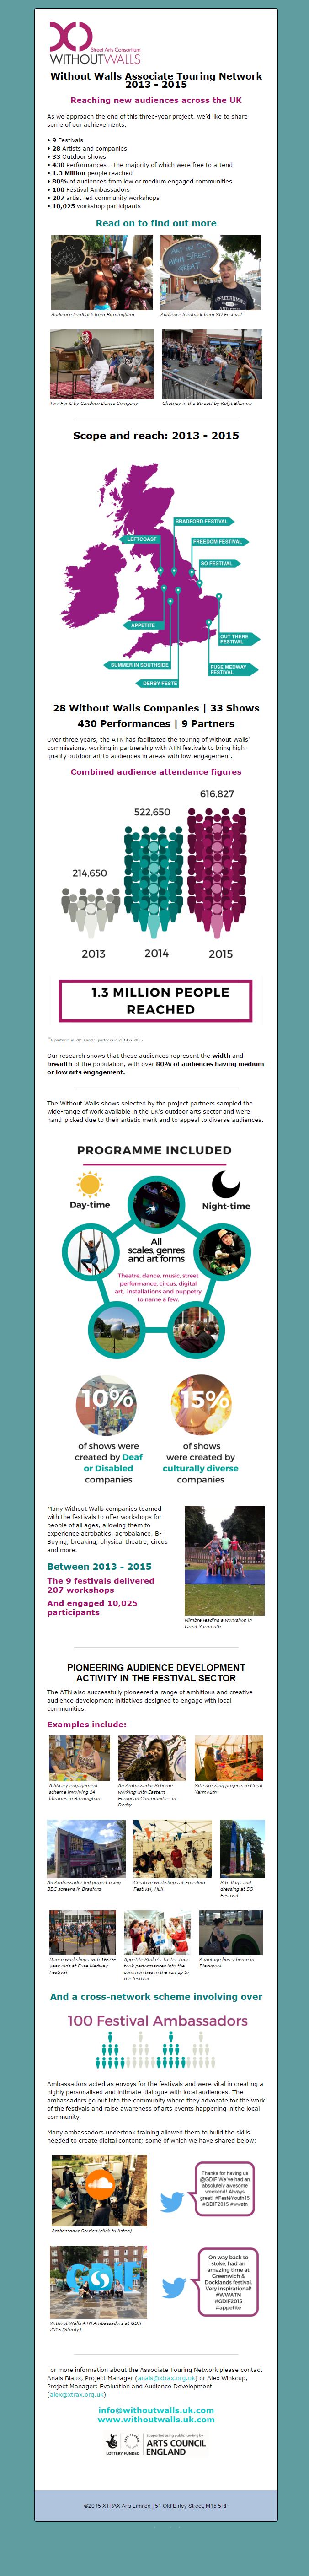 ATN infographics 2013 - 2015